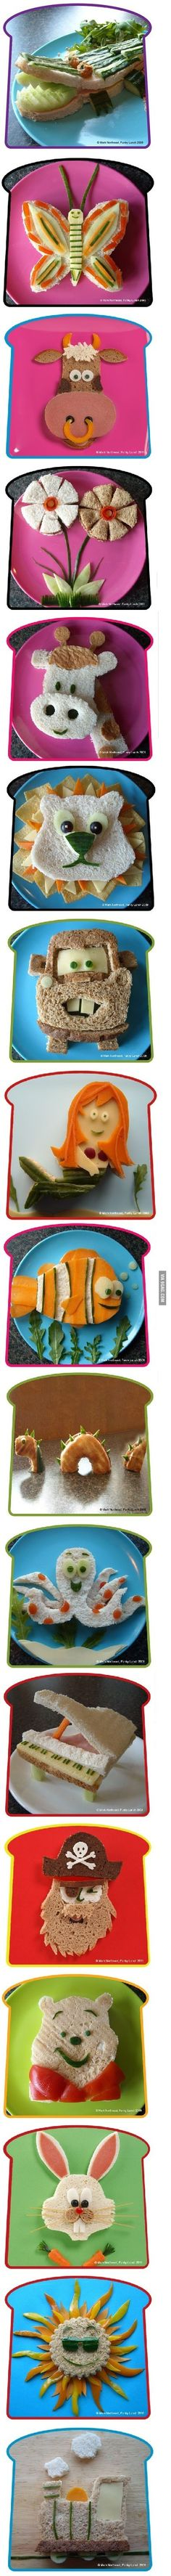 Sandwich you won't eat